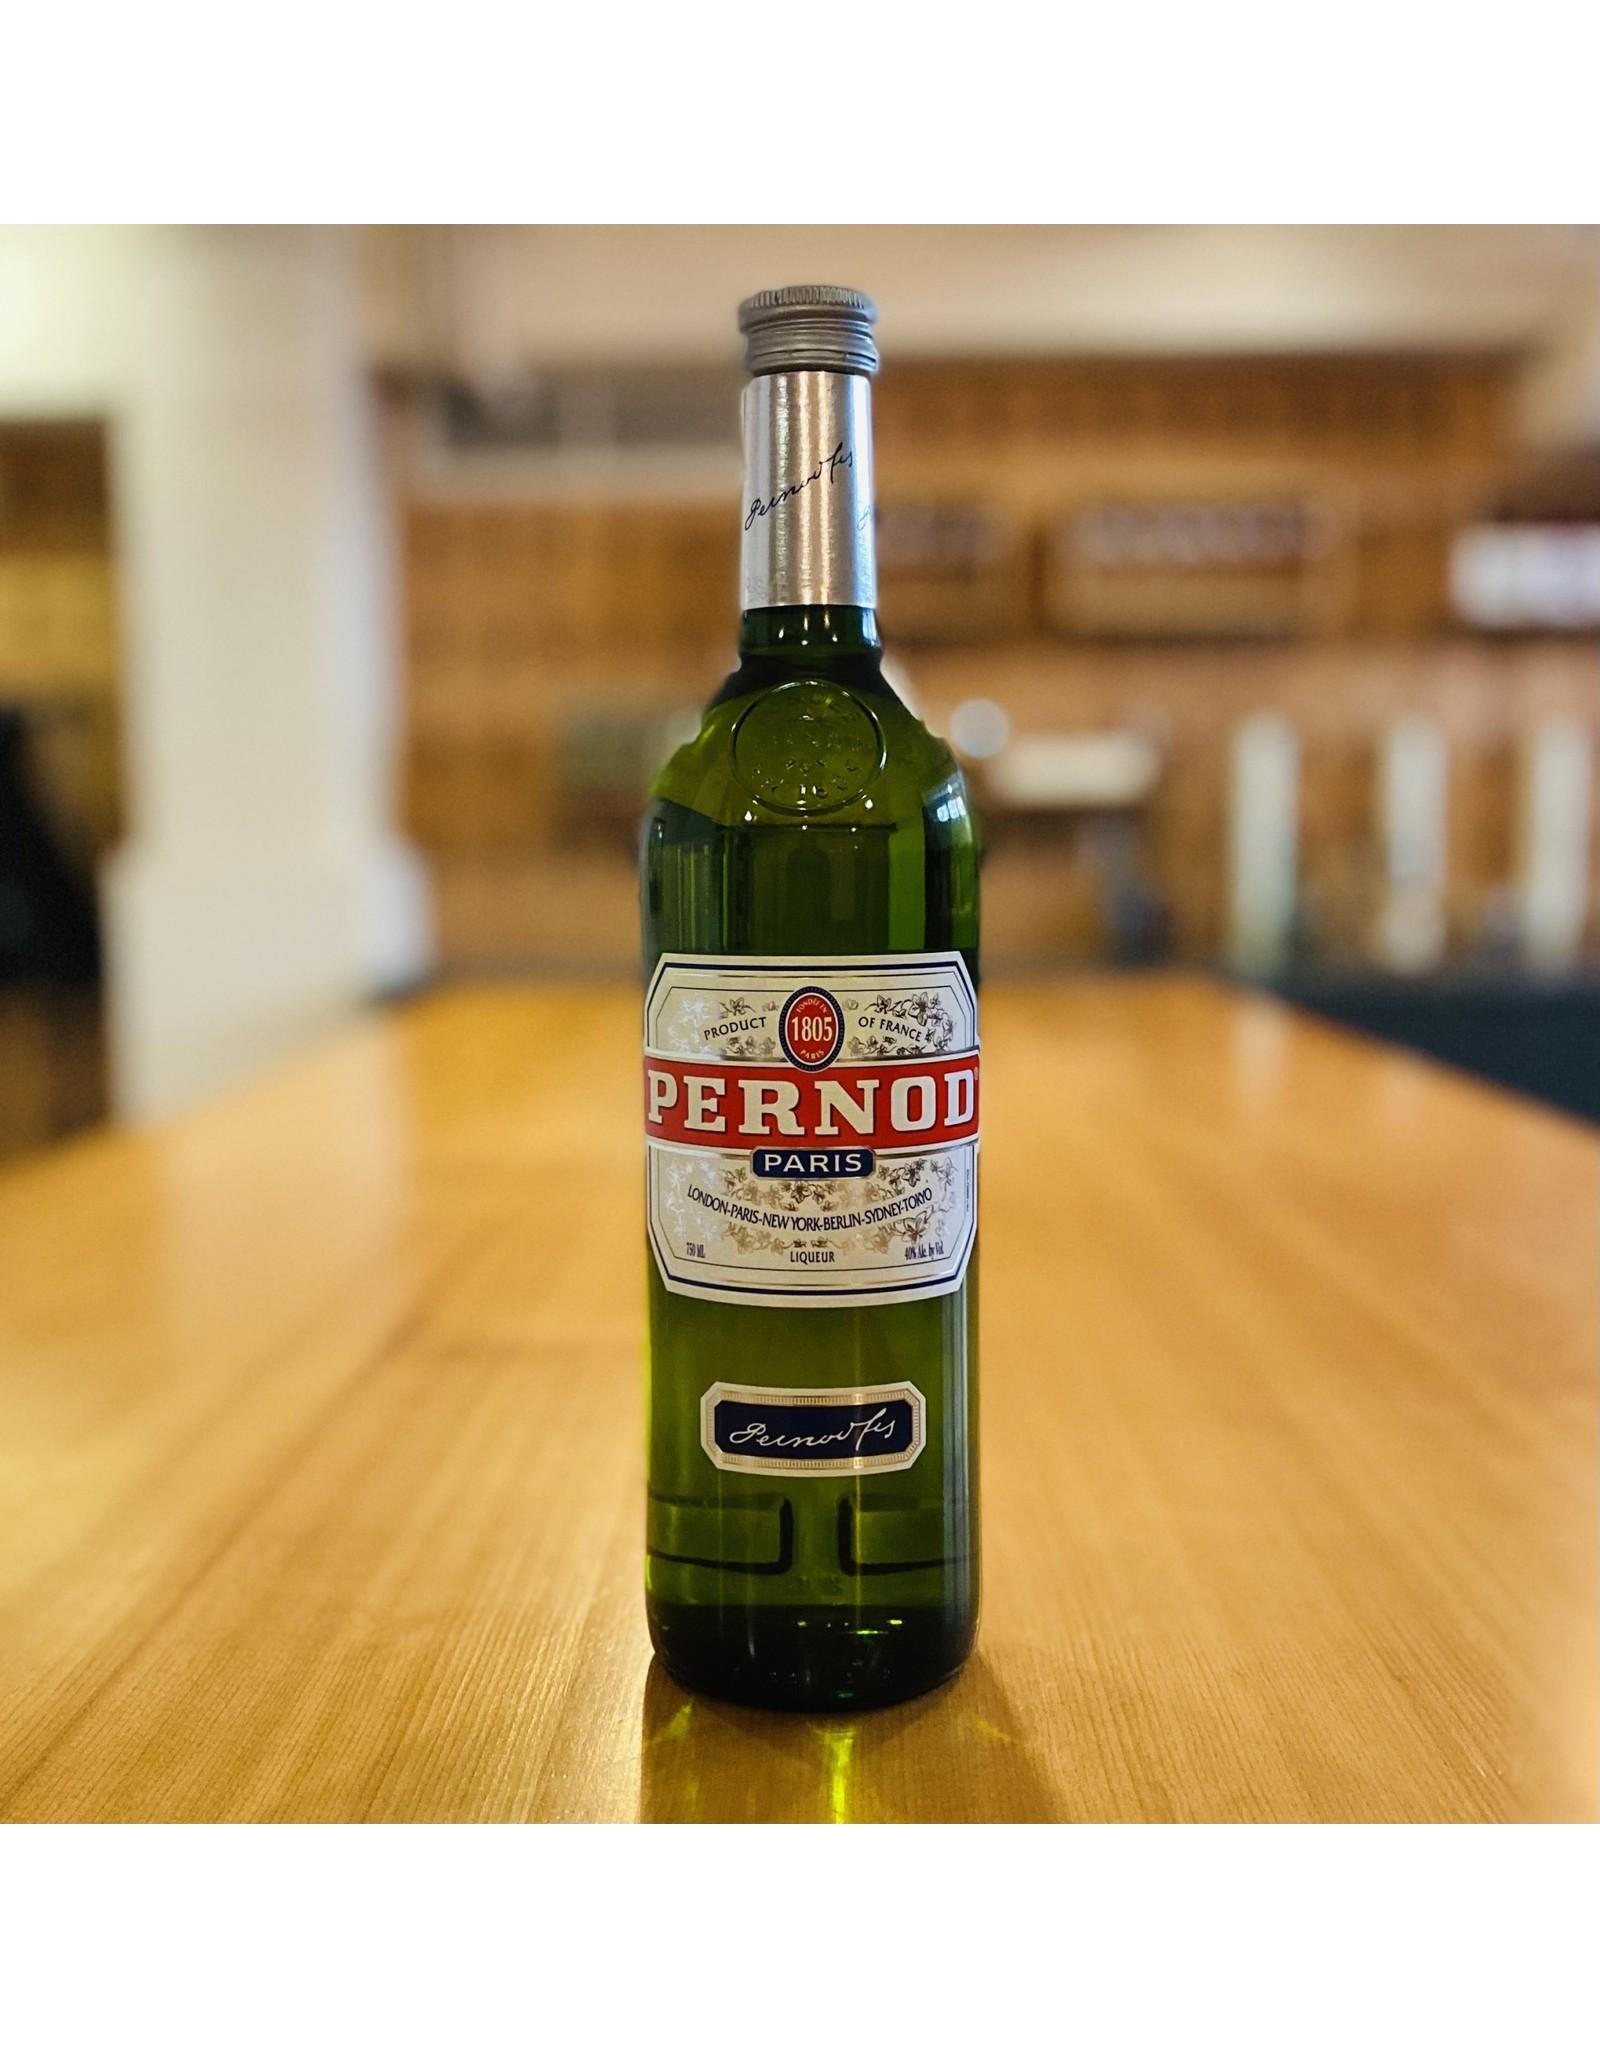 Pernod Anise Liqueur - France